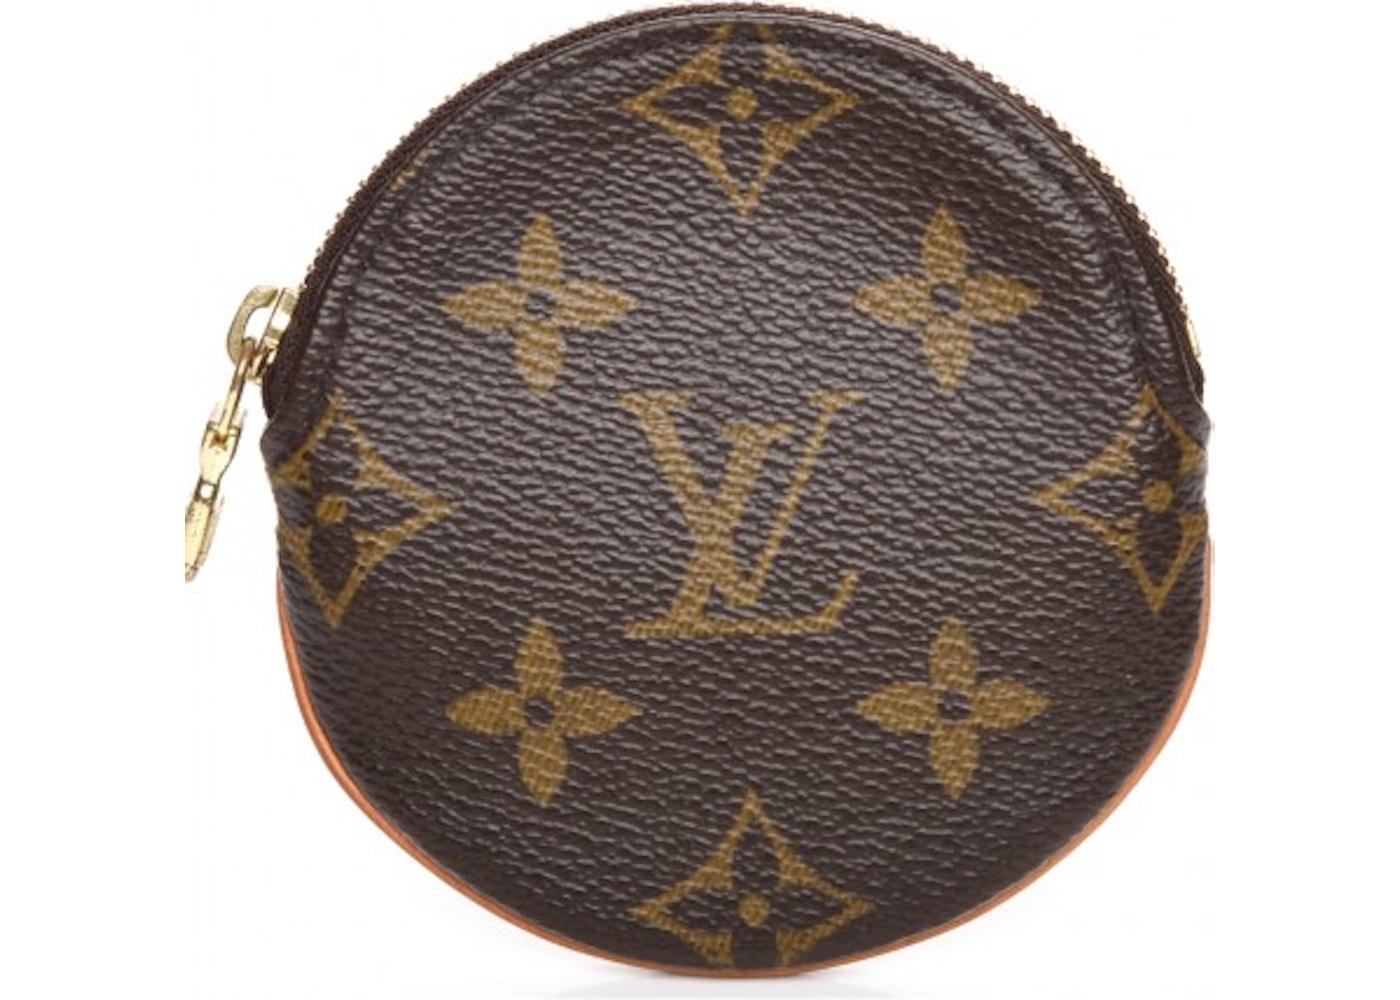 9f4204f4b47a Louis Vuitton Coin Purse Round Monogram Brown. Monogram Brown